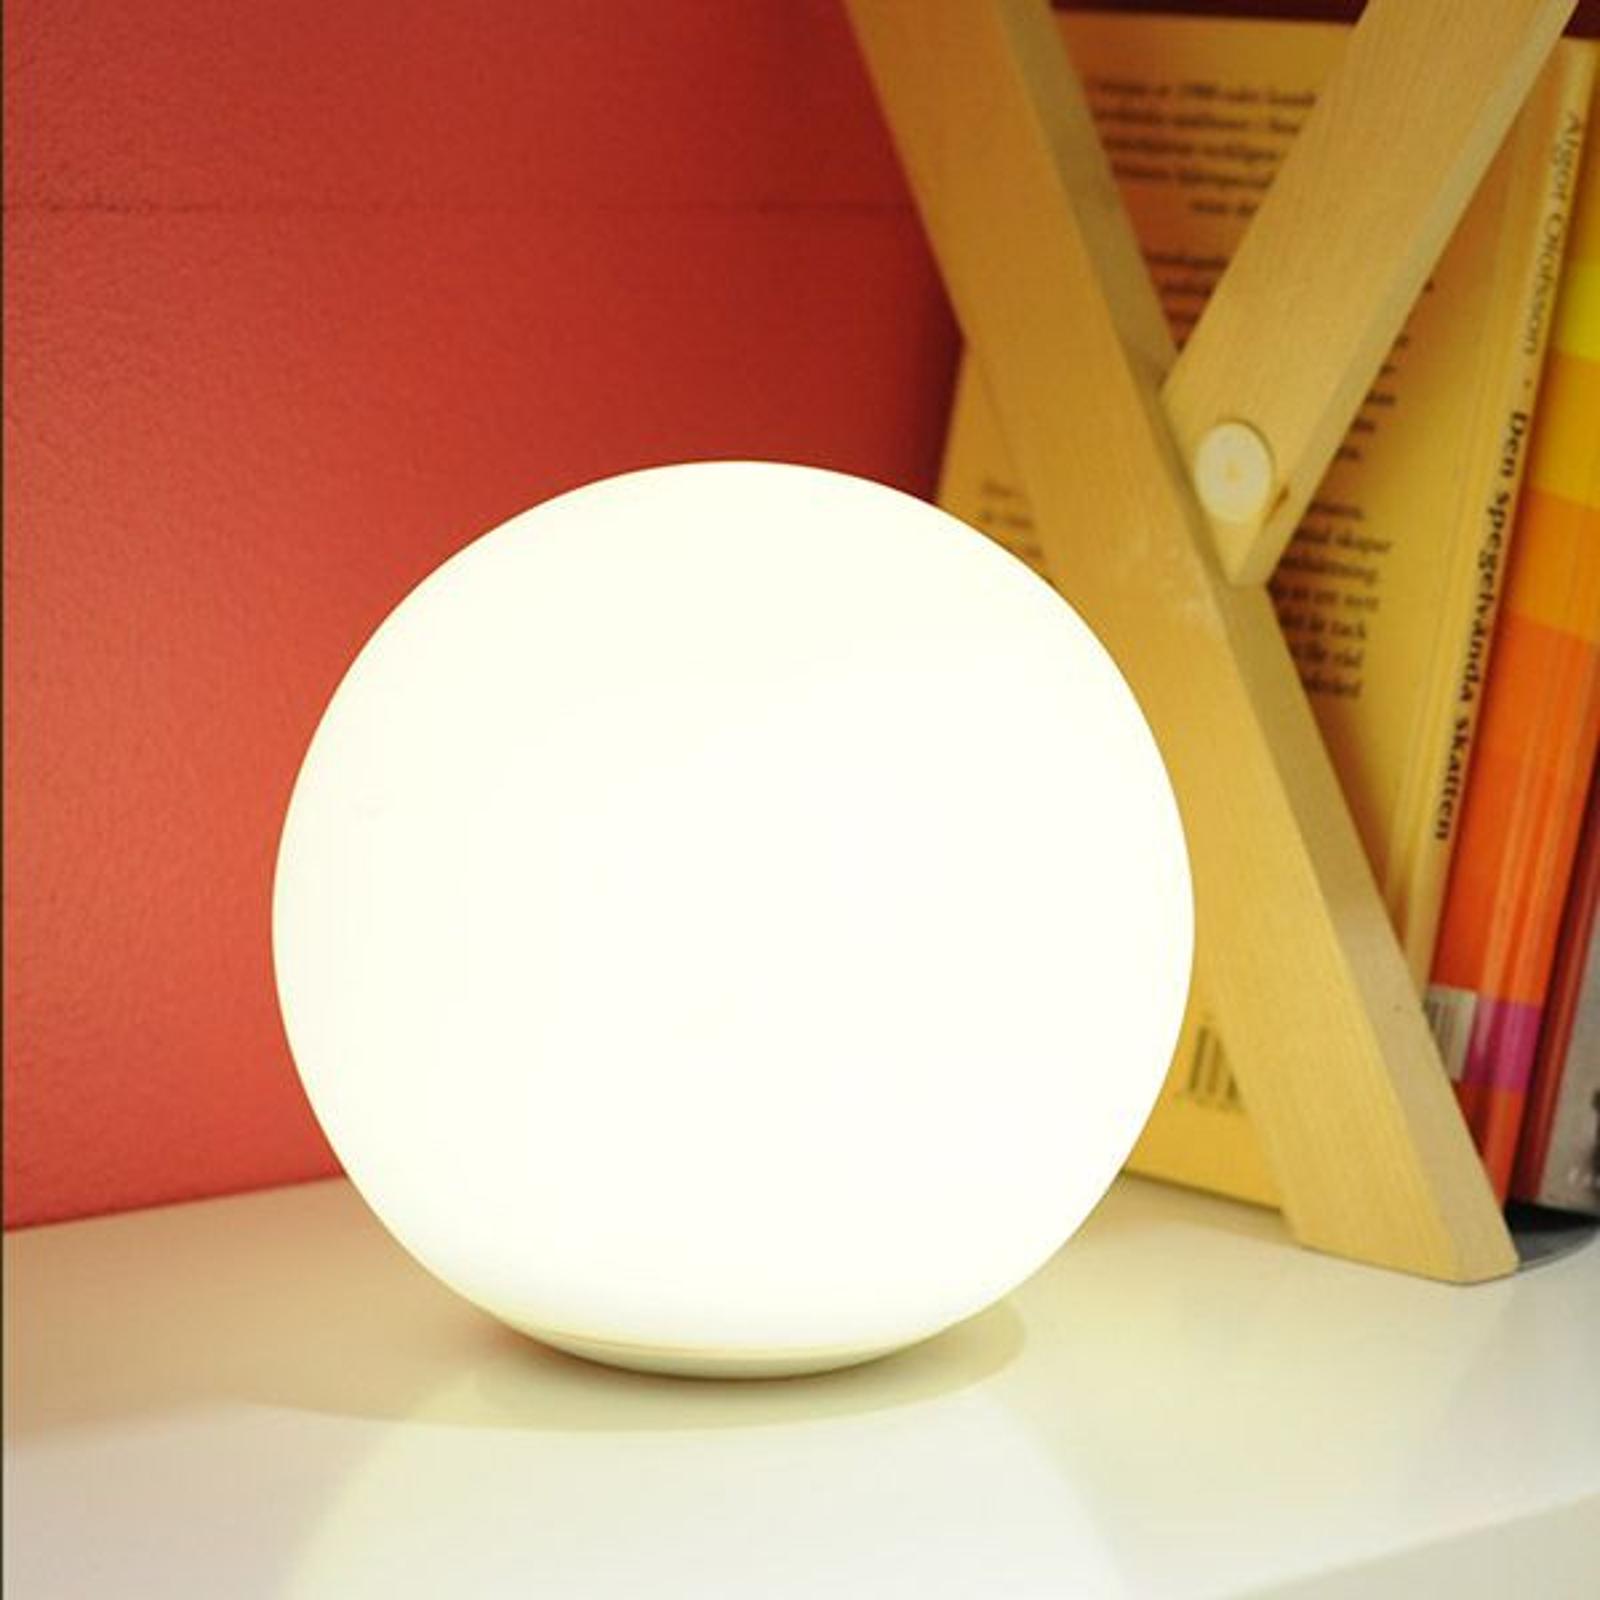 MiPow Playbulb Sphere LED-lyskugle